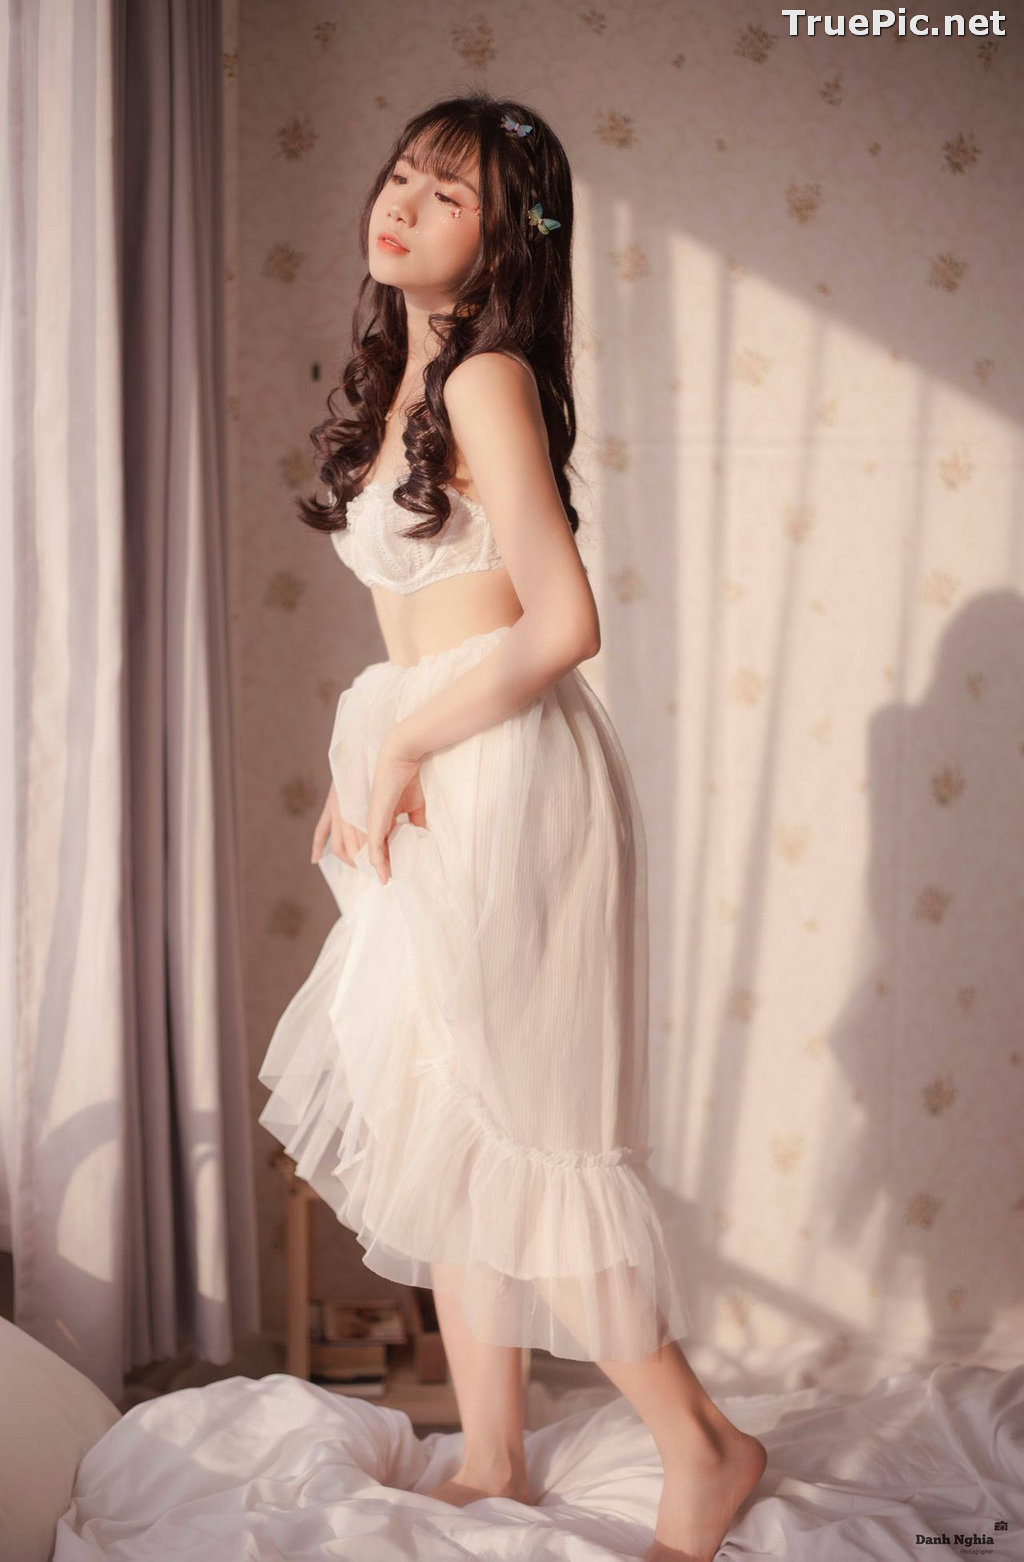 Image Vietnamese Cute Girl - Tran Thi Anh Thu - Beautiful White Butterfly - TruePic.net - Picture-5